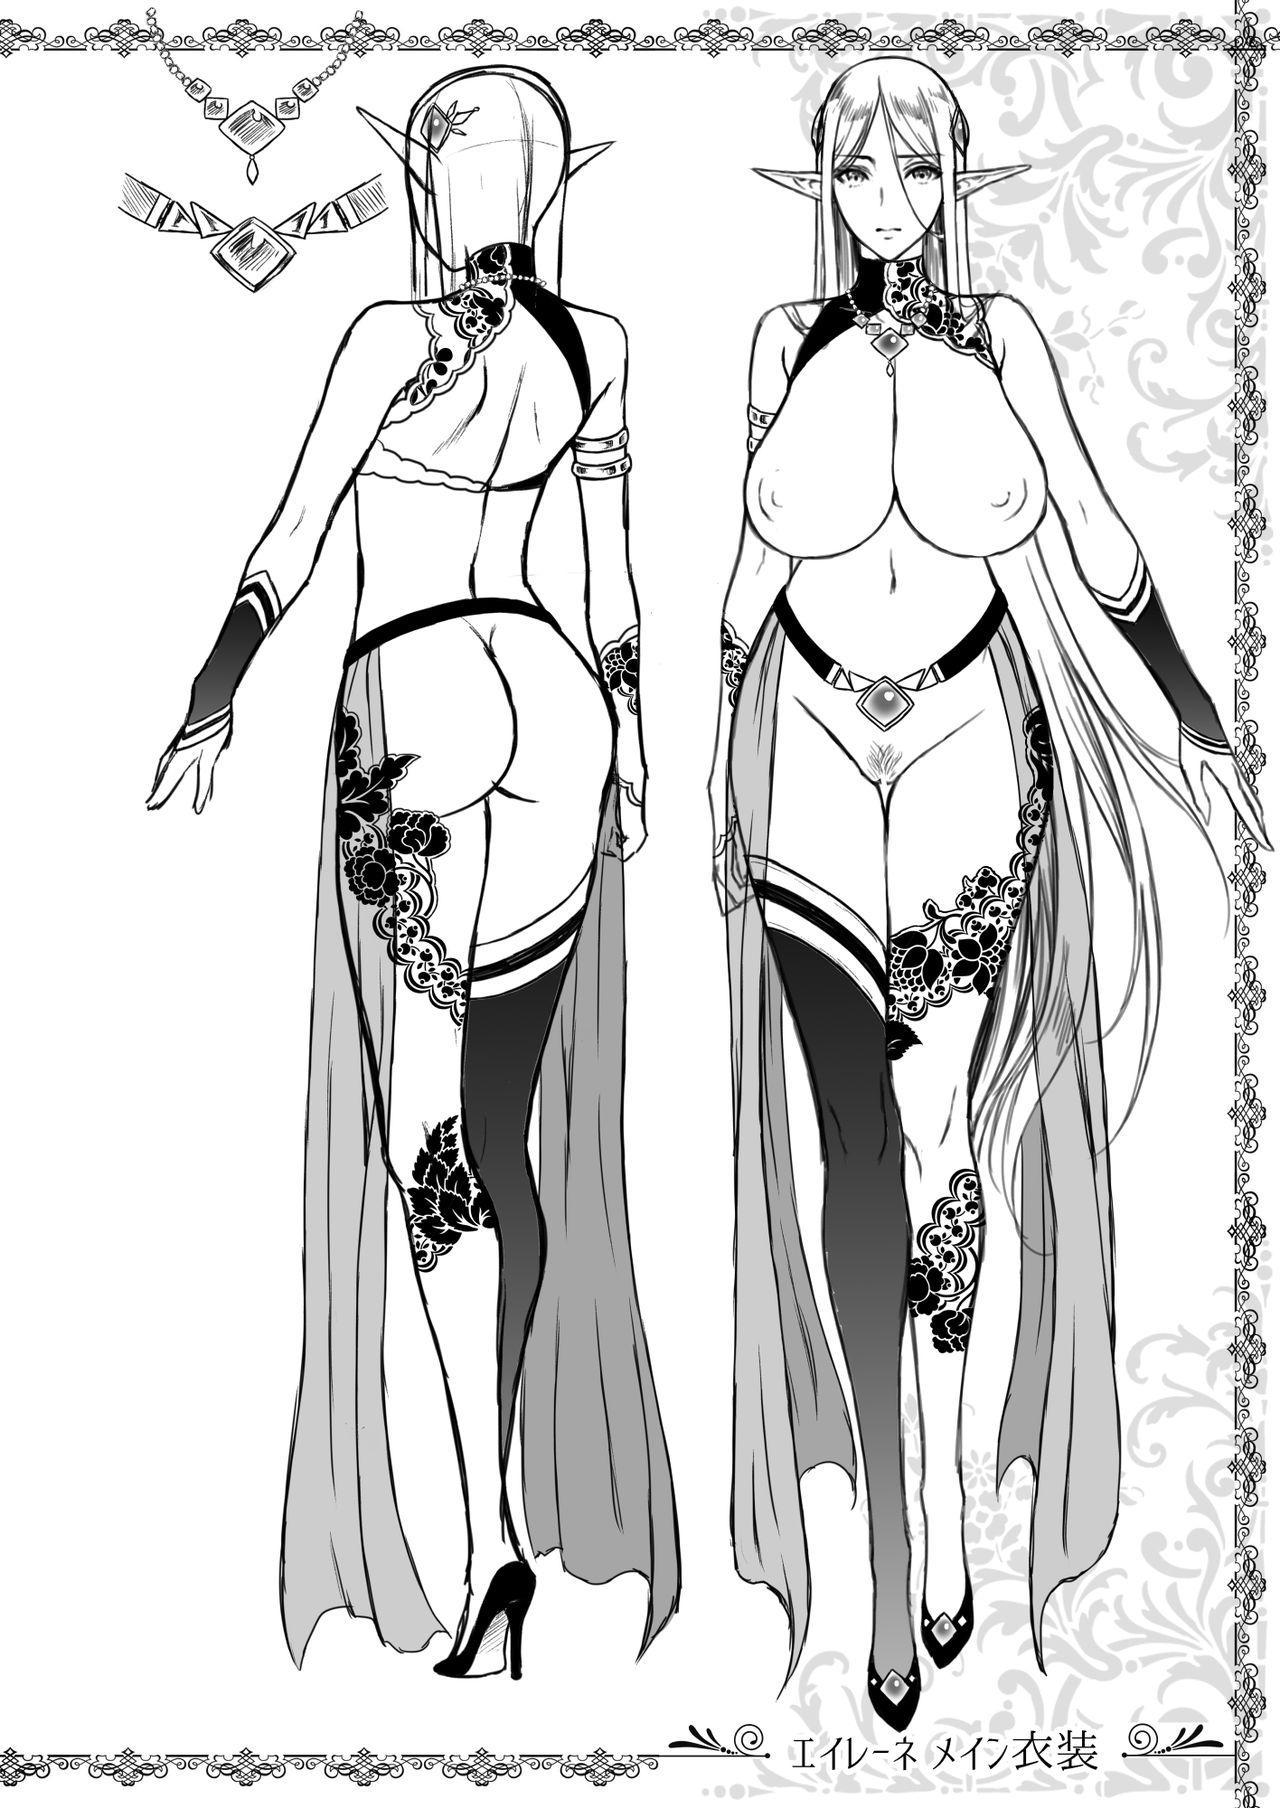 Tasogare no Shou Elf 5 | The Melancholy of the Prostitute Elf 5 36